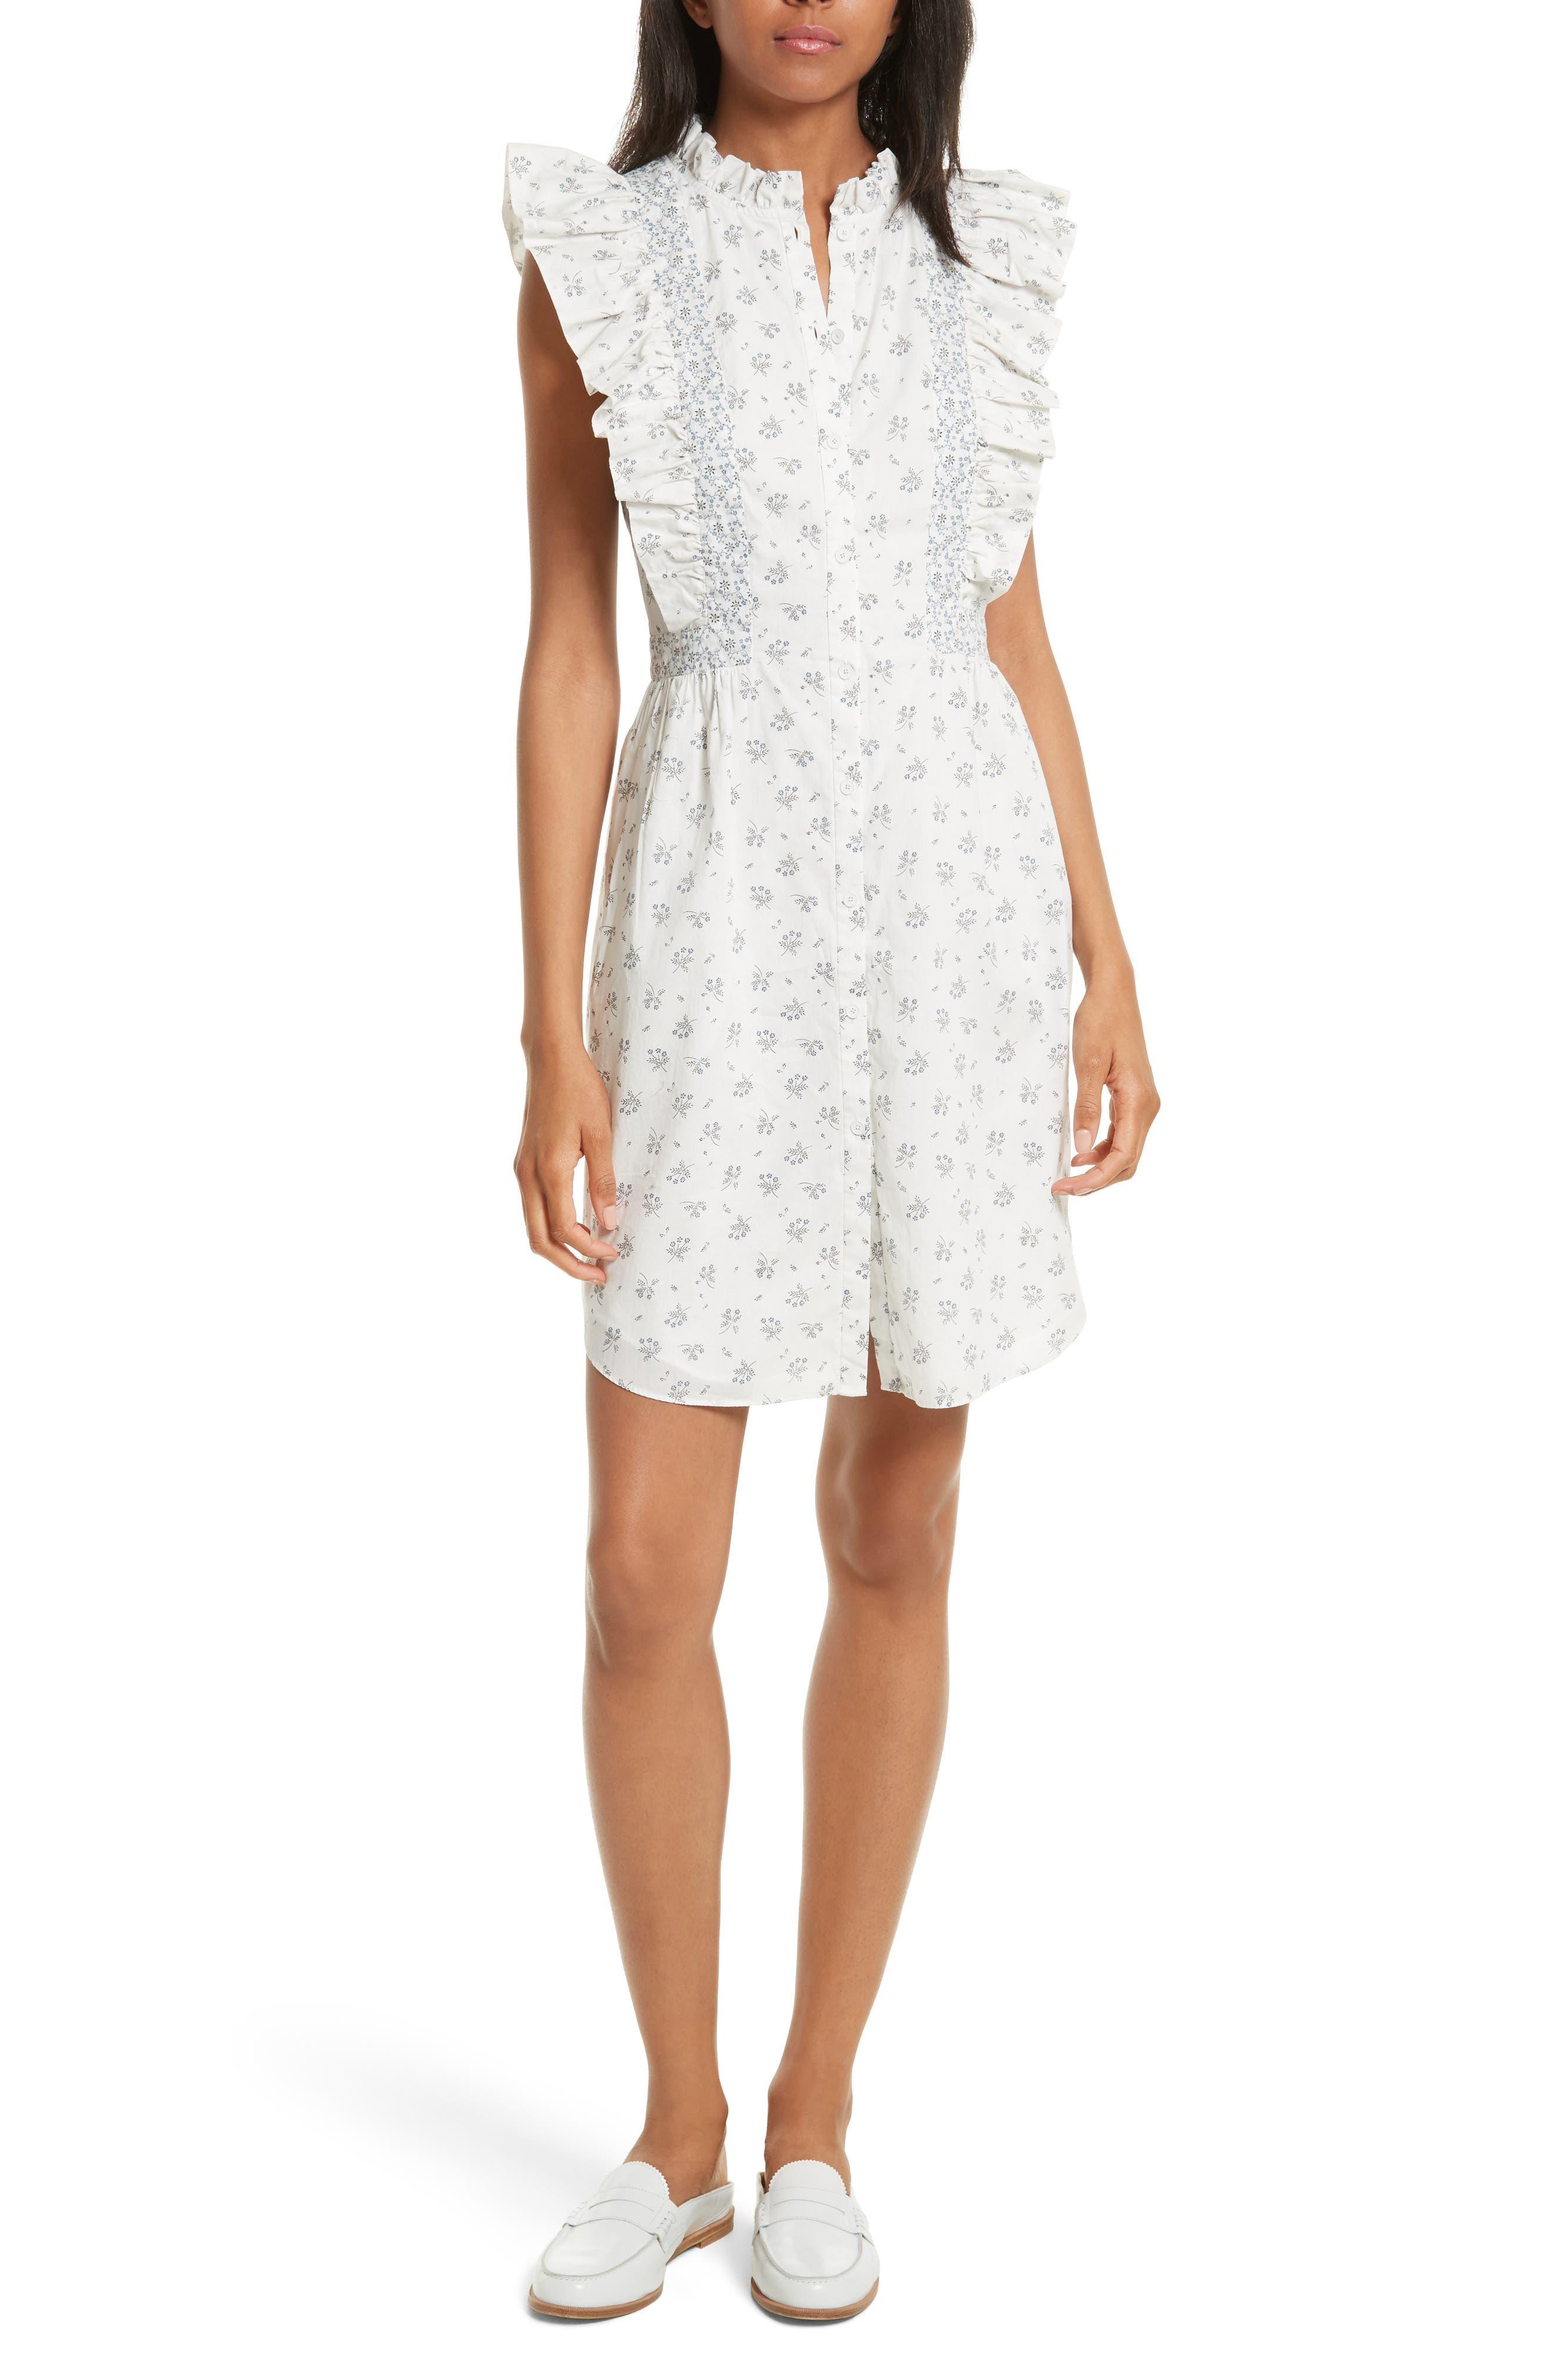 Alternate Image 1 Selected - La Vie Rebecca Taylor Breeze Print Ruffle Shirtdress